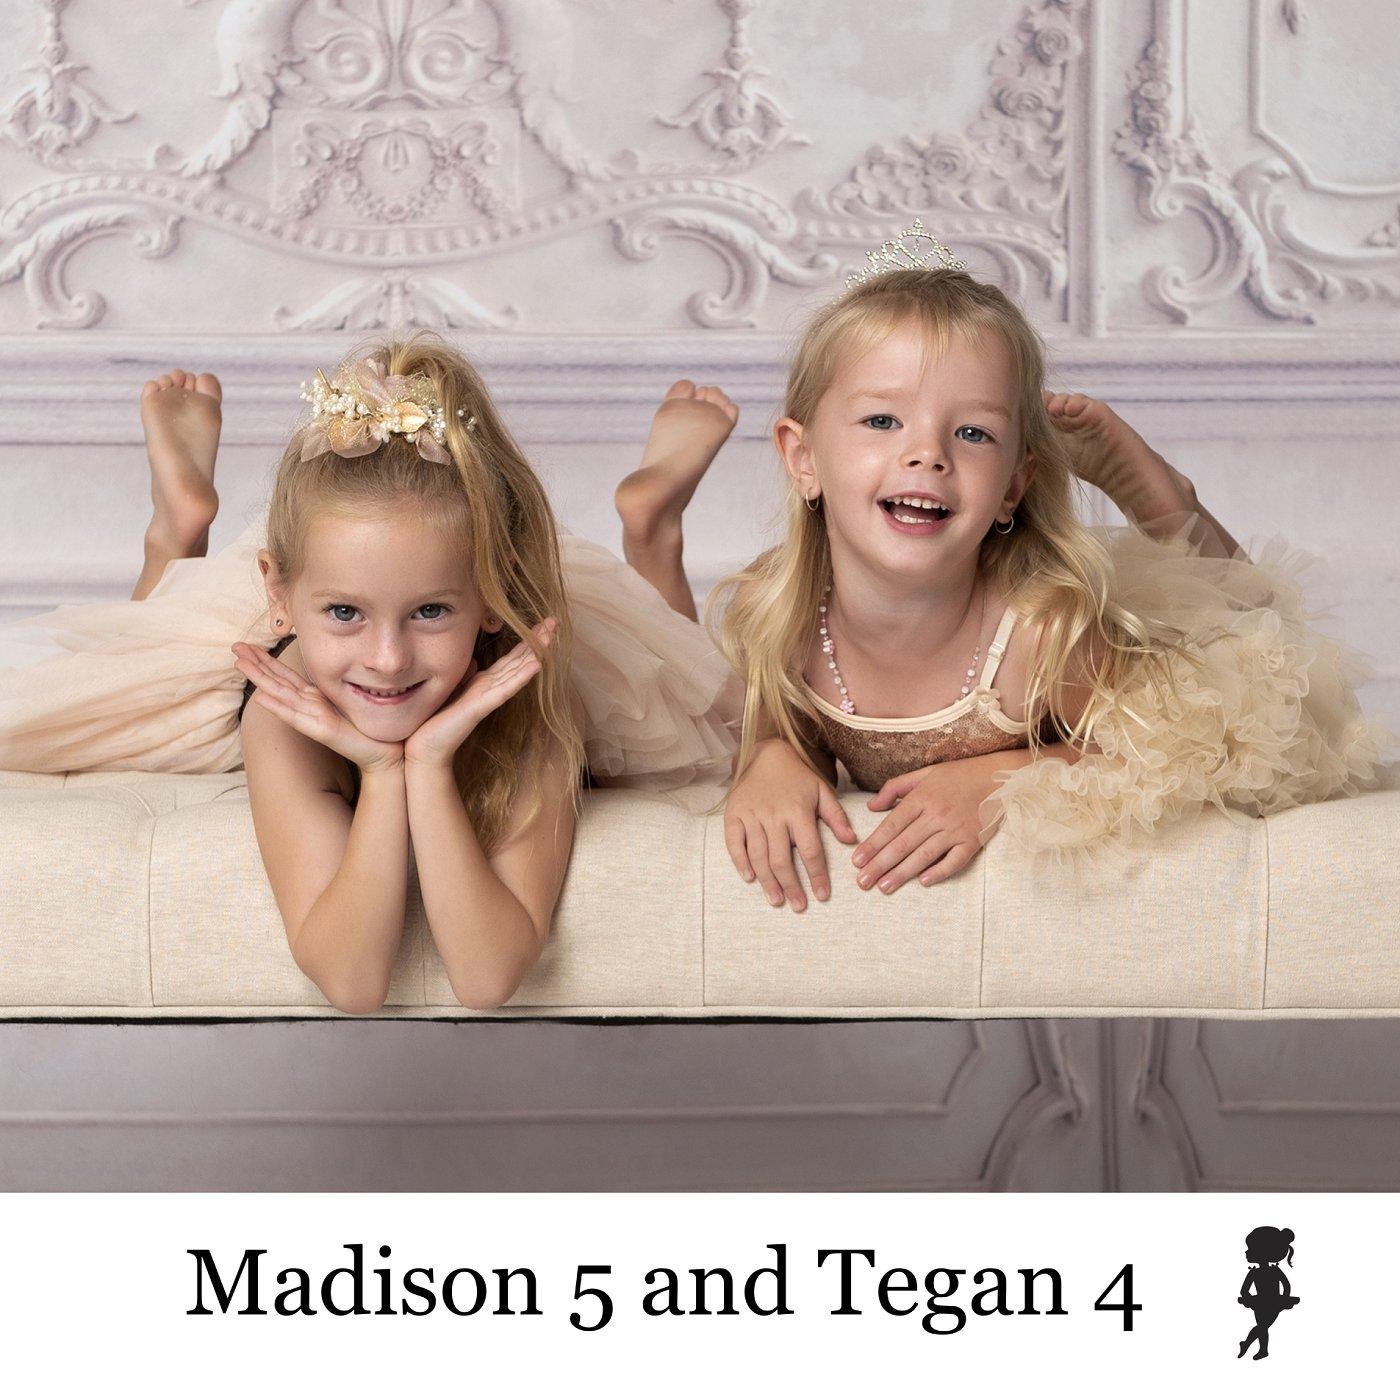 LB4219- Madison 5 and Tegan 4.jpg